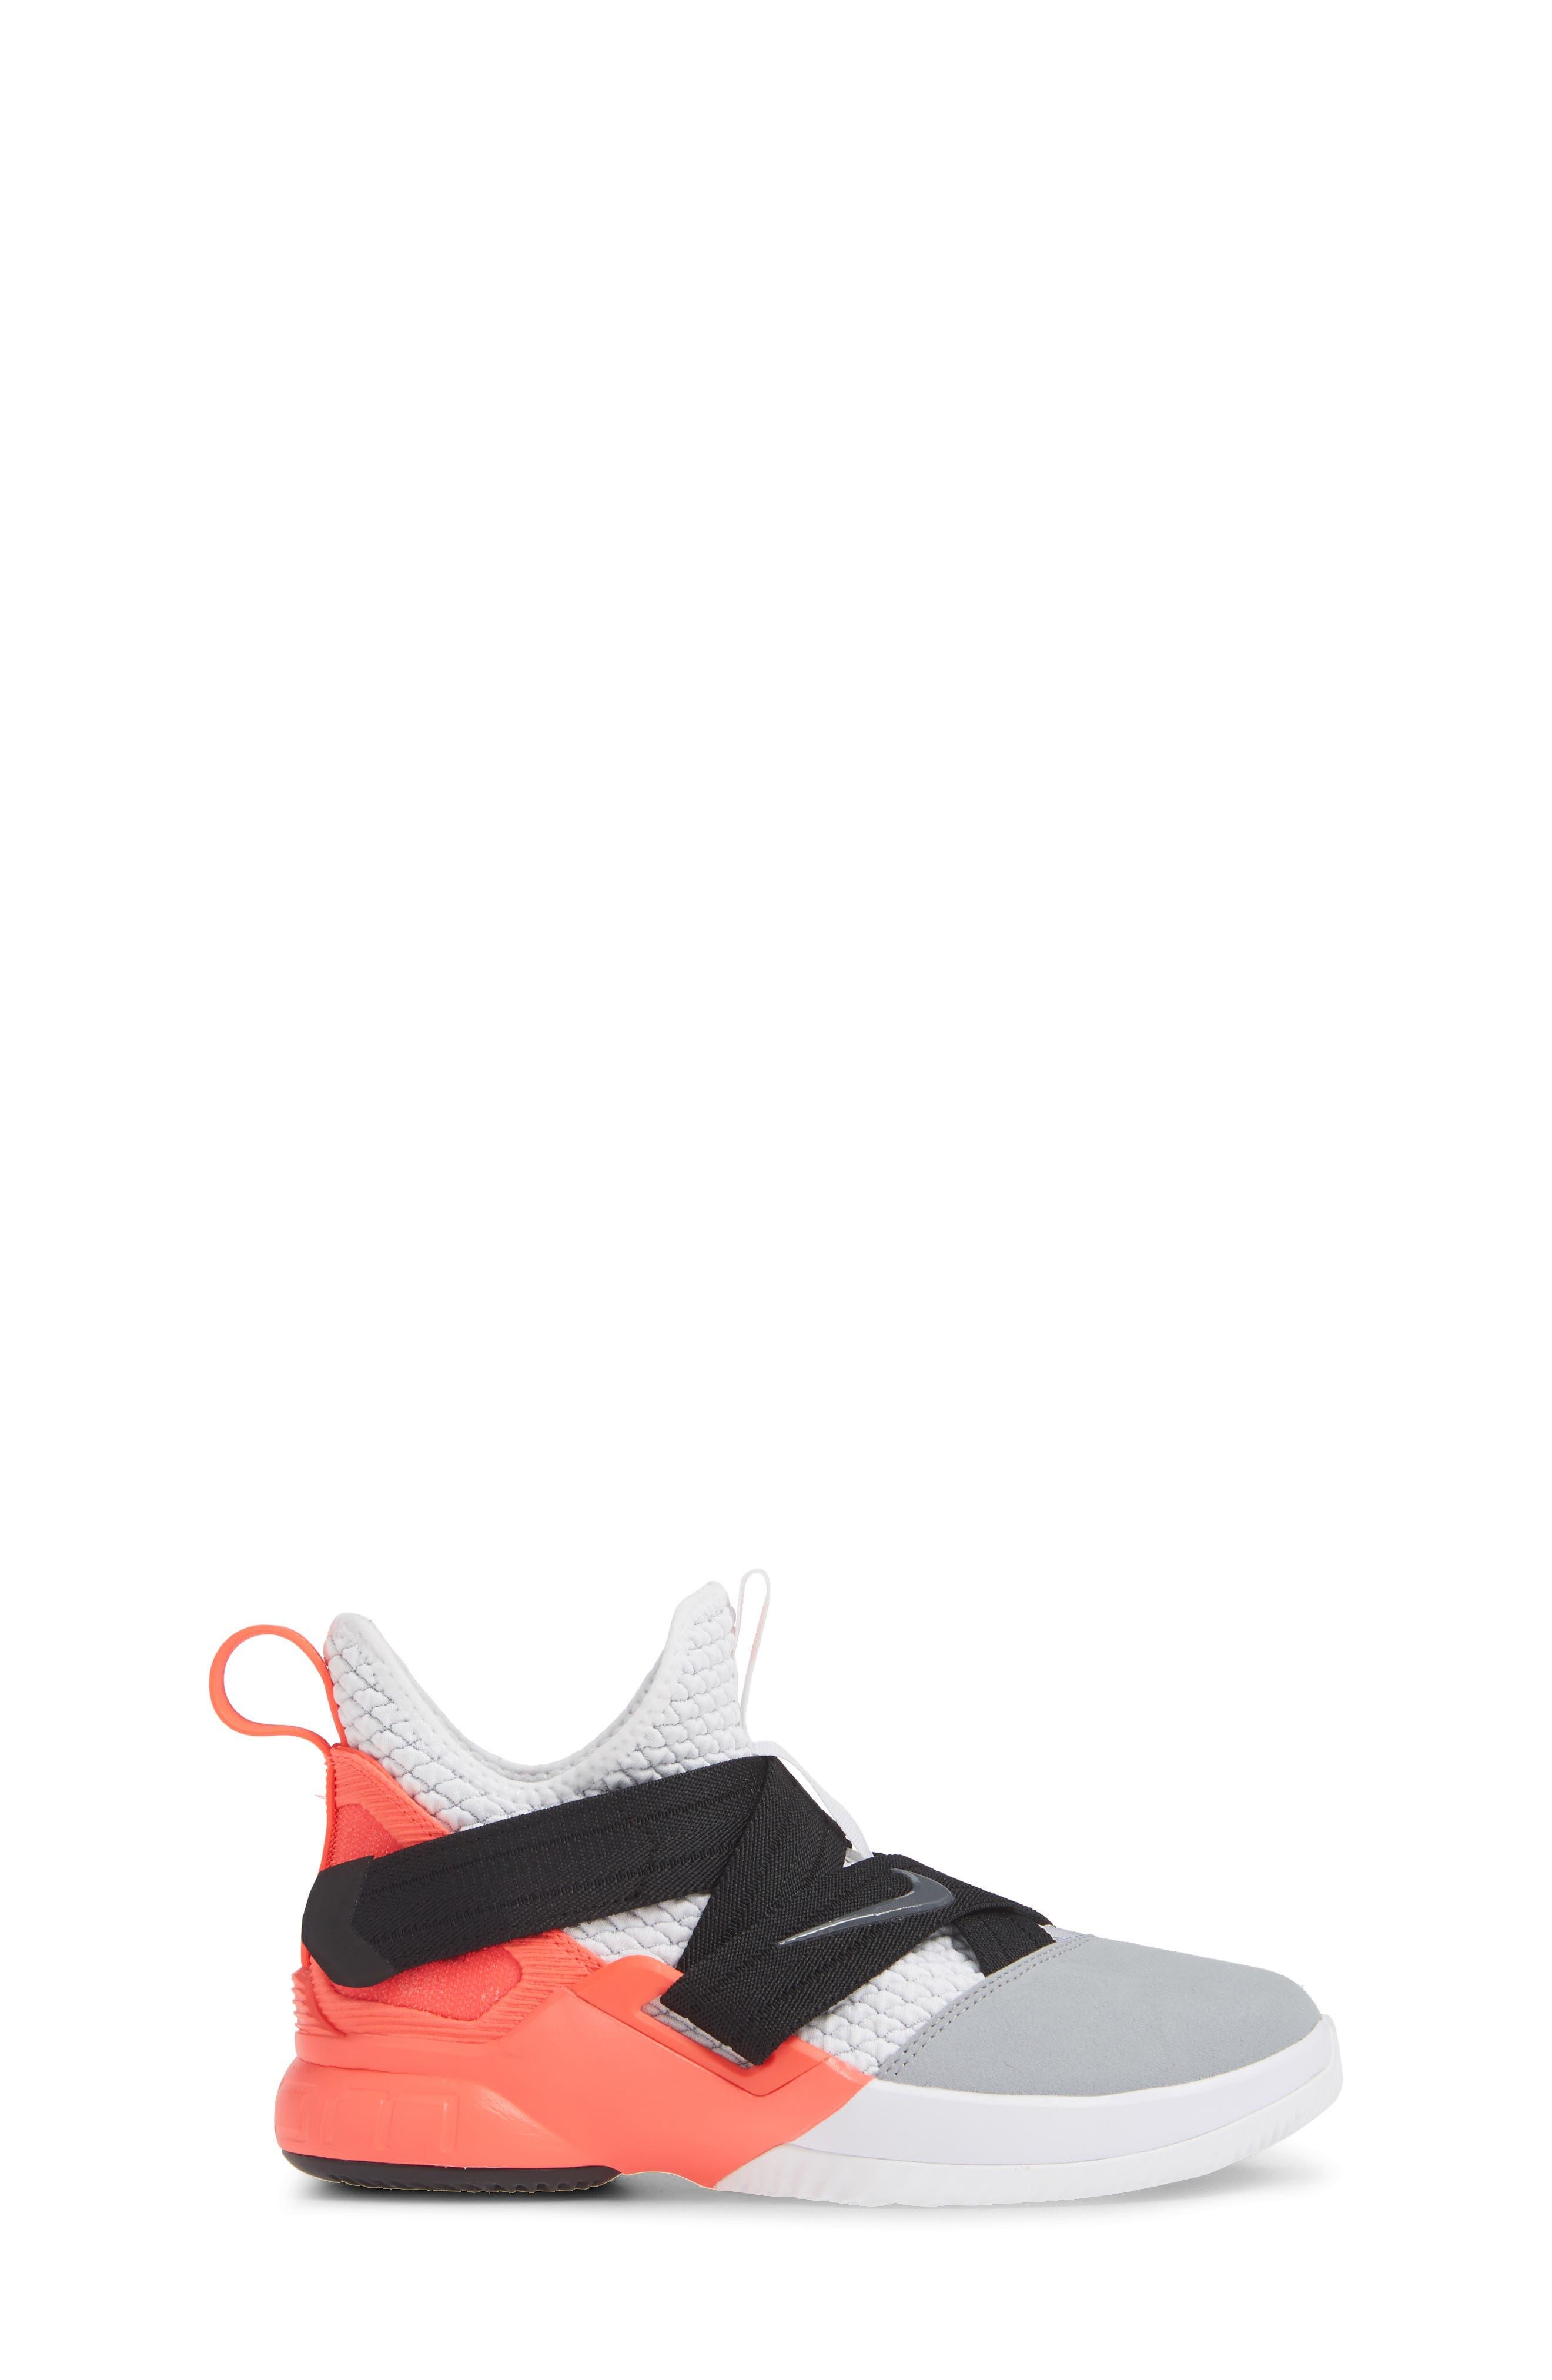 LeBron Soldier XII SFG Basketball Shoe,                             Alternate thumbnail 3, color,                             WHITE/ DARK GREY CRIMSON